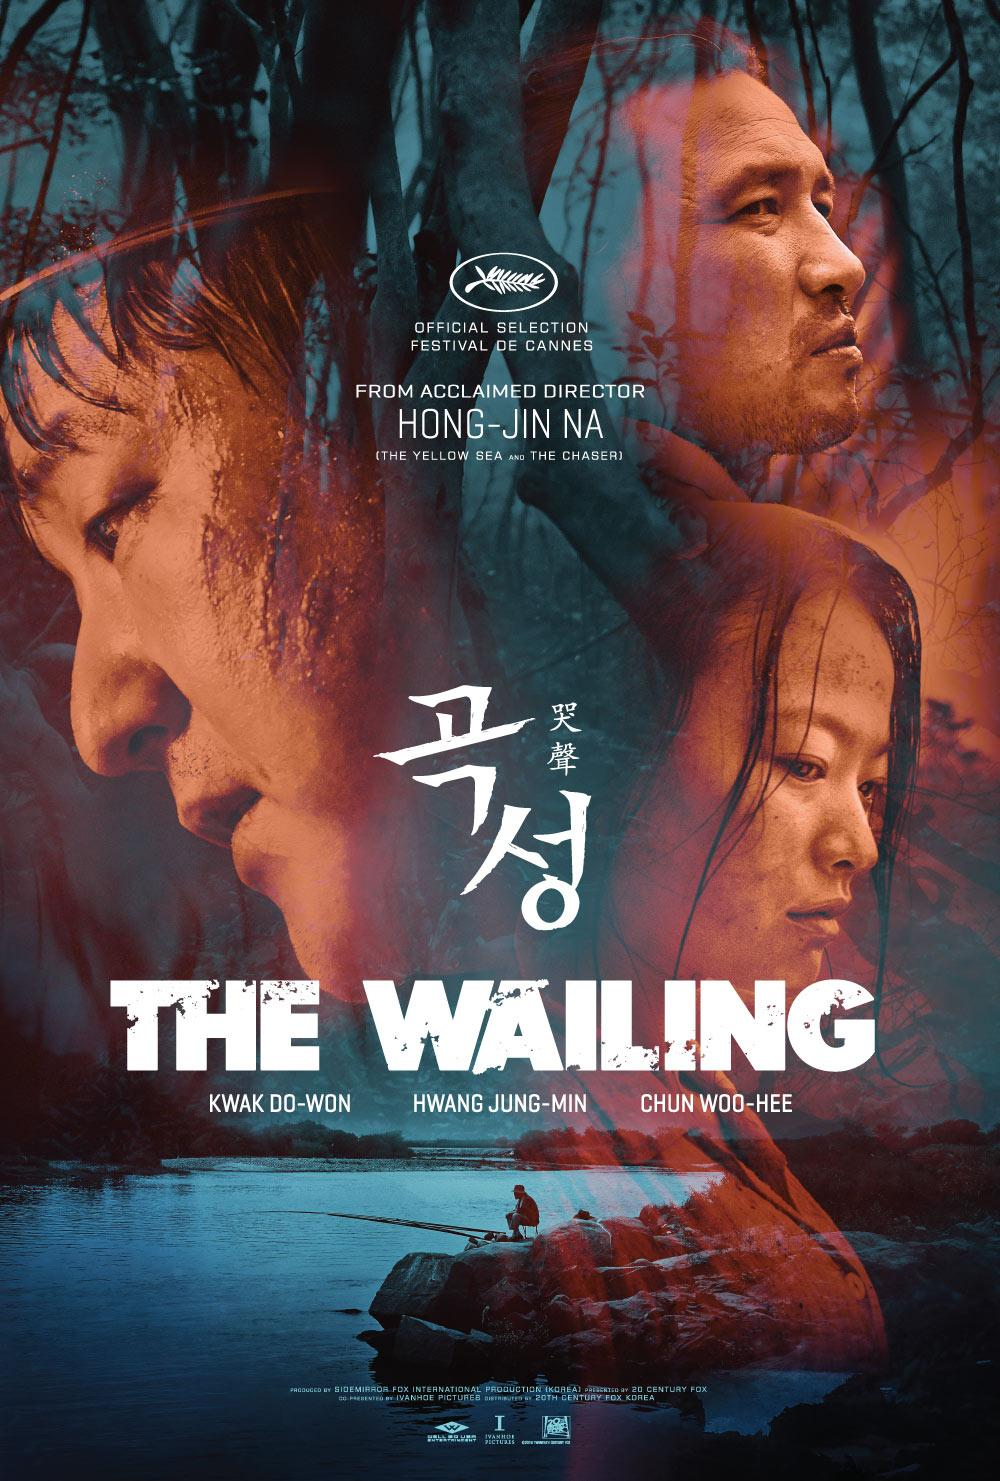 2. The Wailing